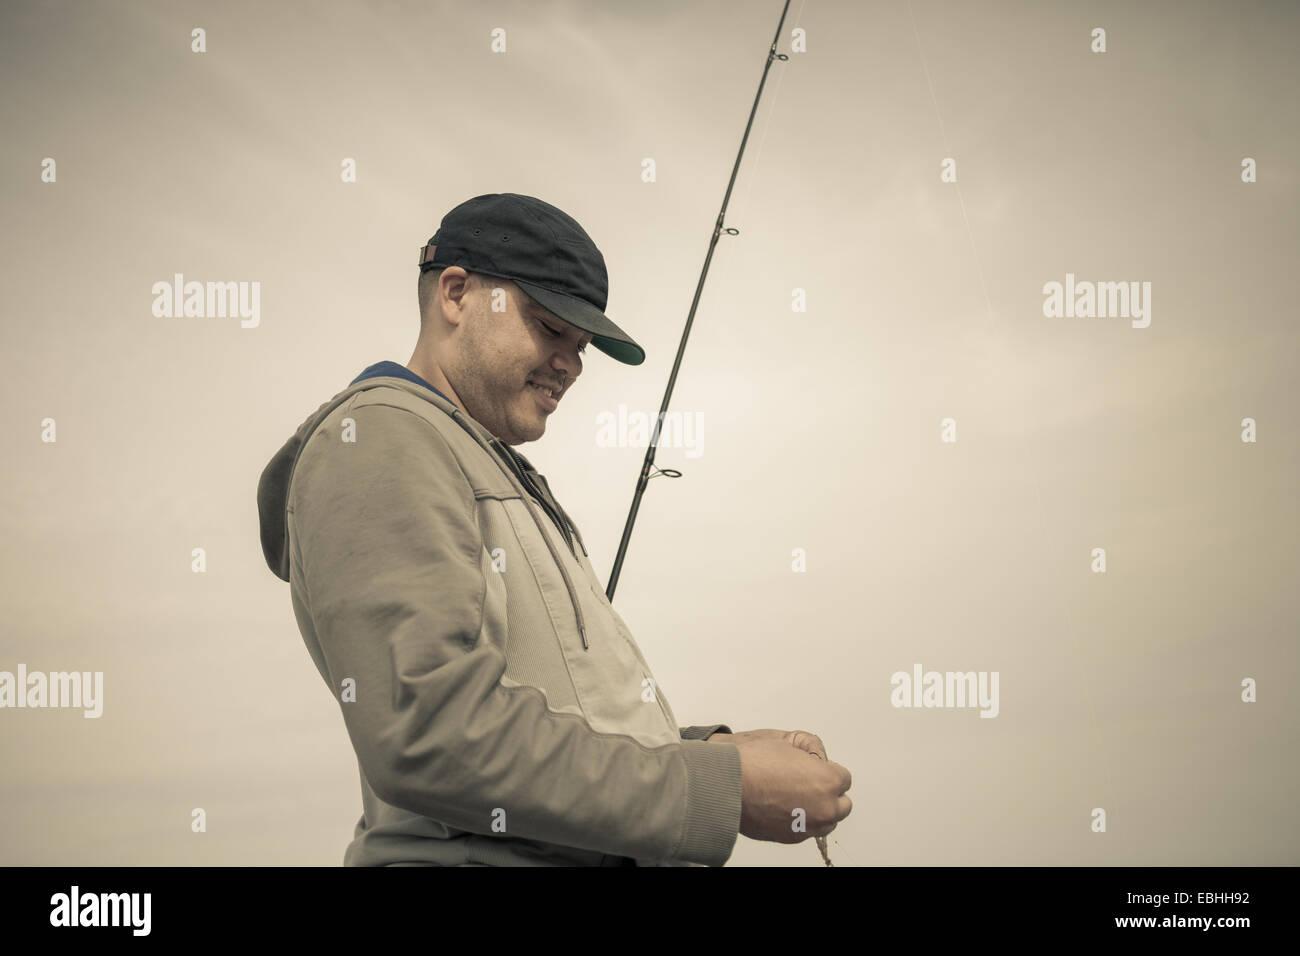 Fisherman preparazione di canna da pesca, Truro, Massachusetts, Cape Cod, STATI UNITI D'AMERICA Foto Stock